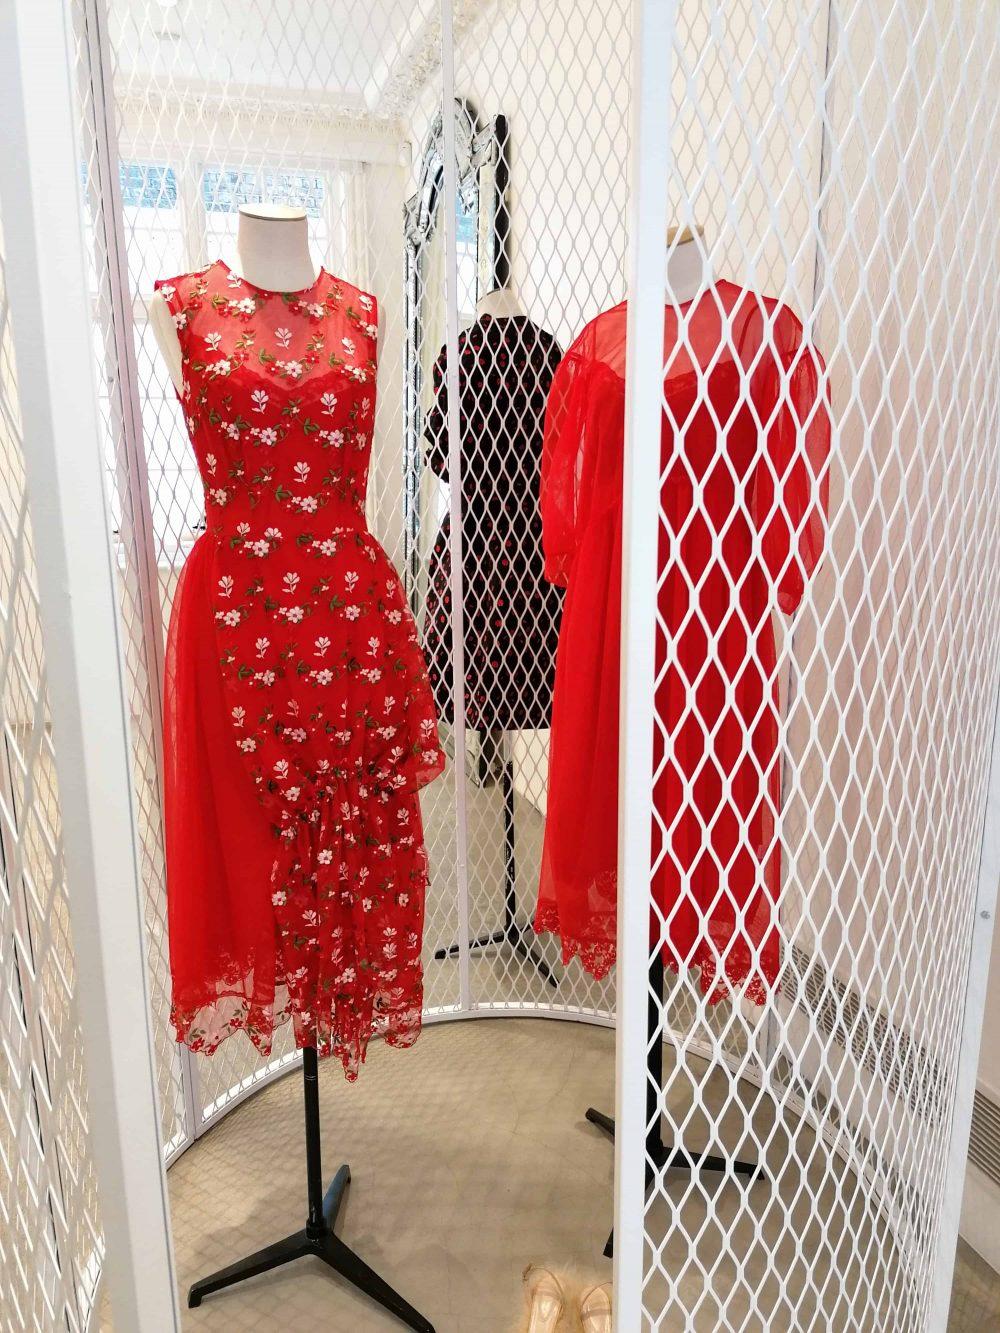 dresses by fashion designer Simone Rocha, shop on Mount Street, Mayfair, Latest in Design Tour, Fashion Tours London